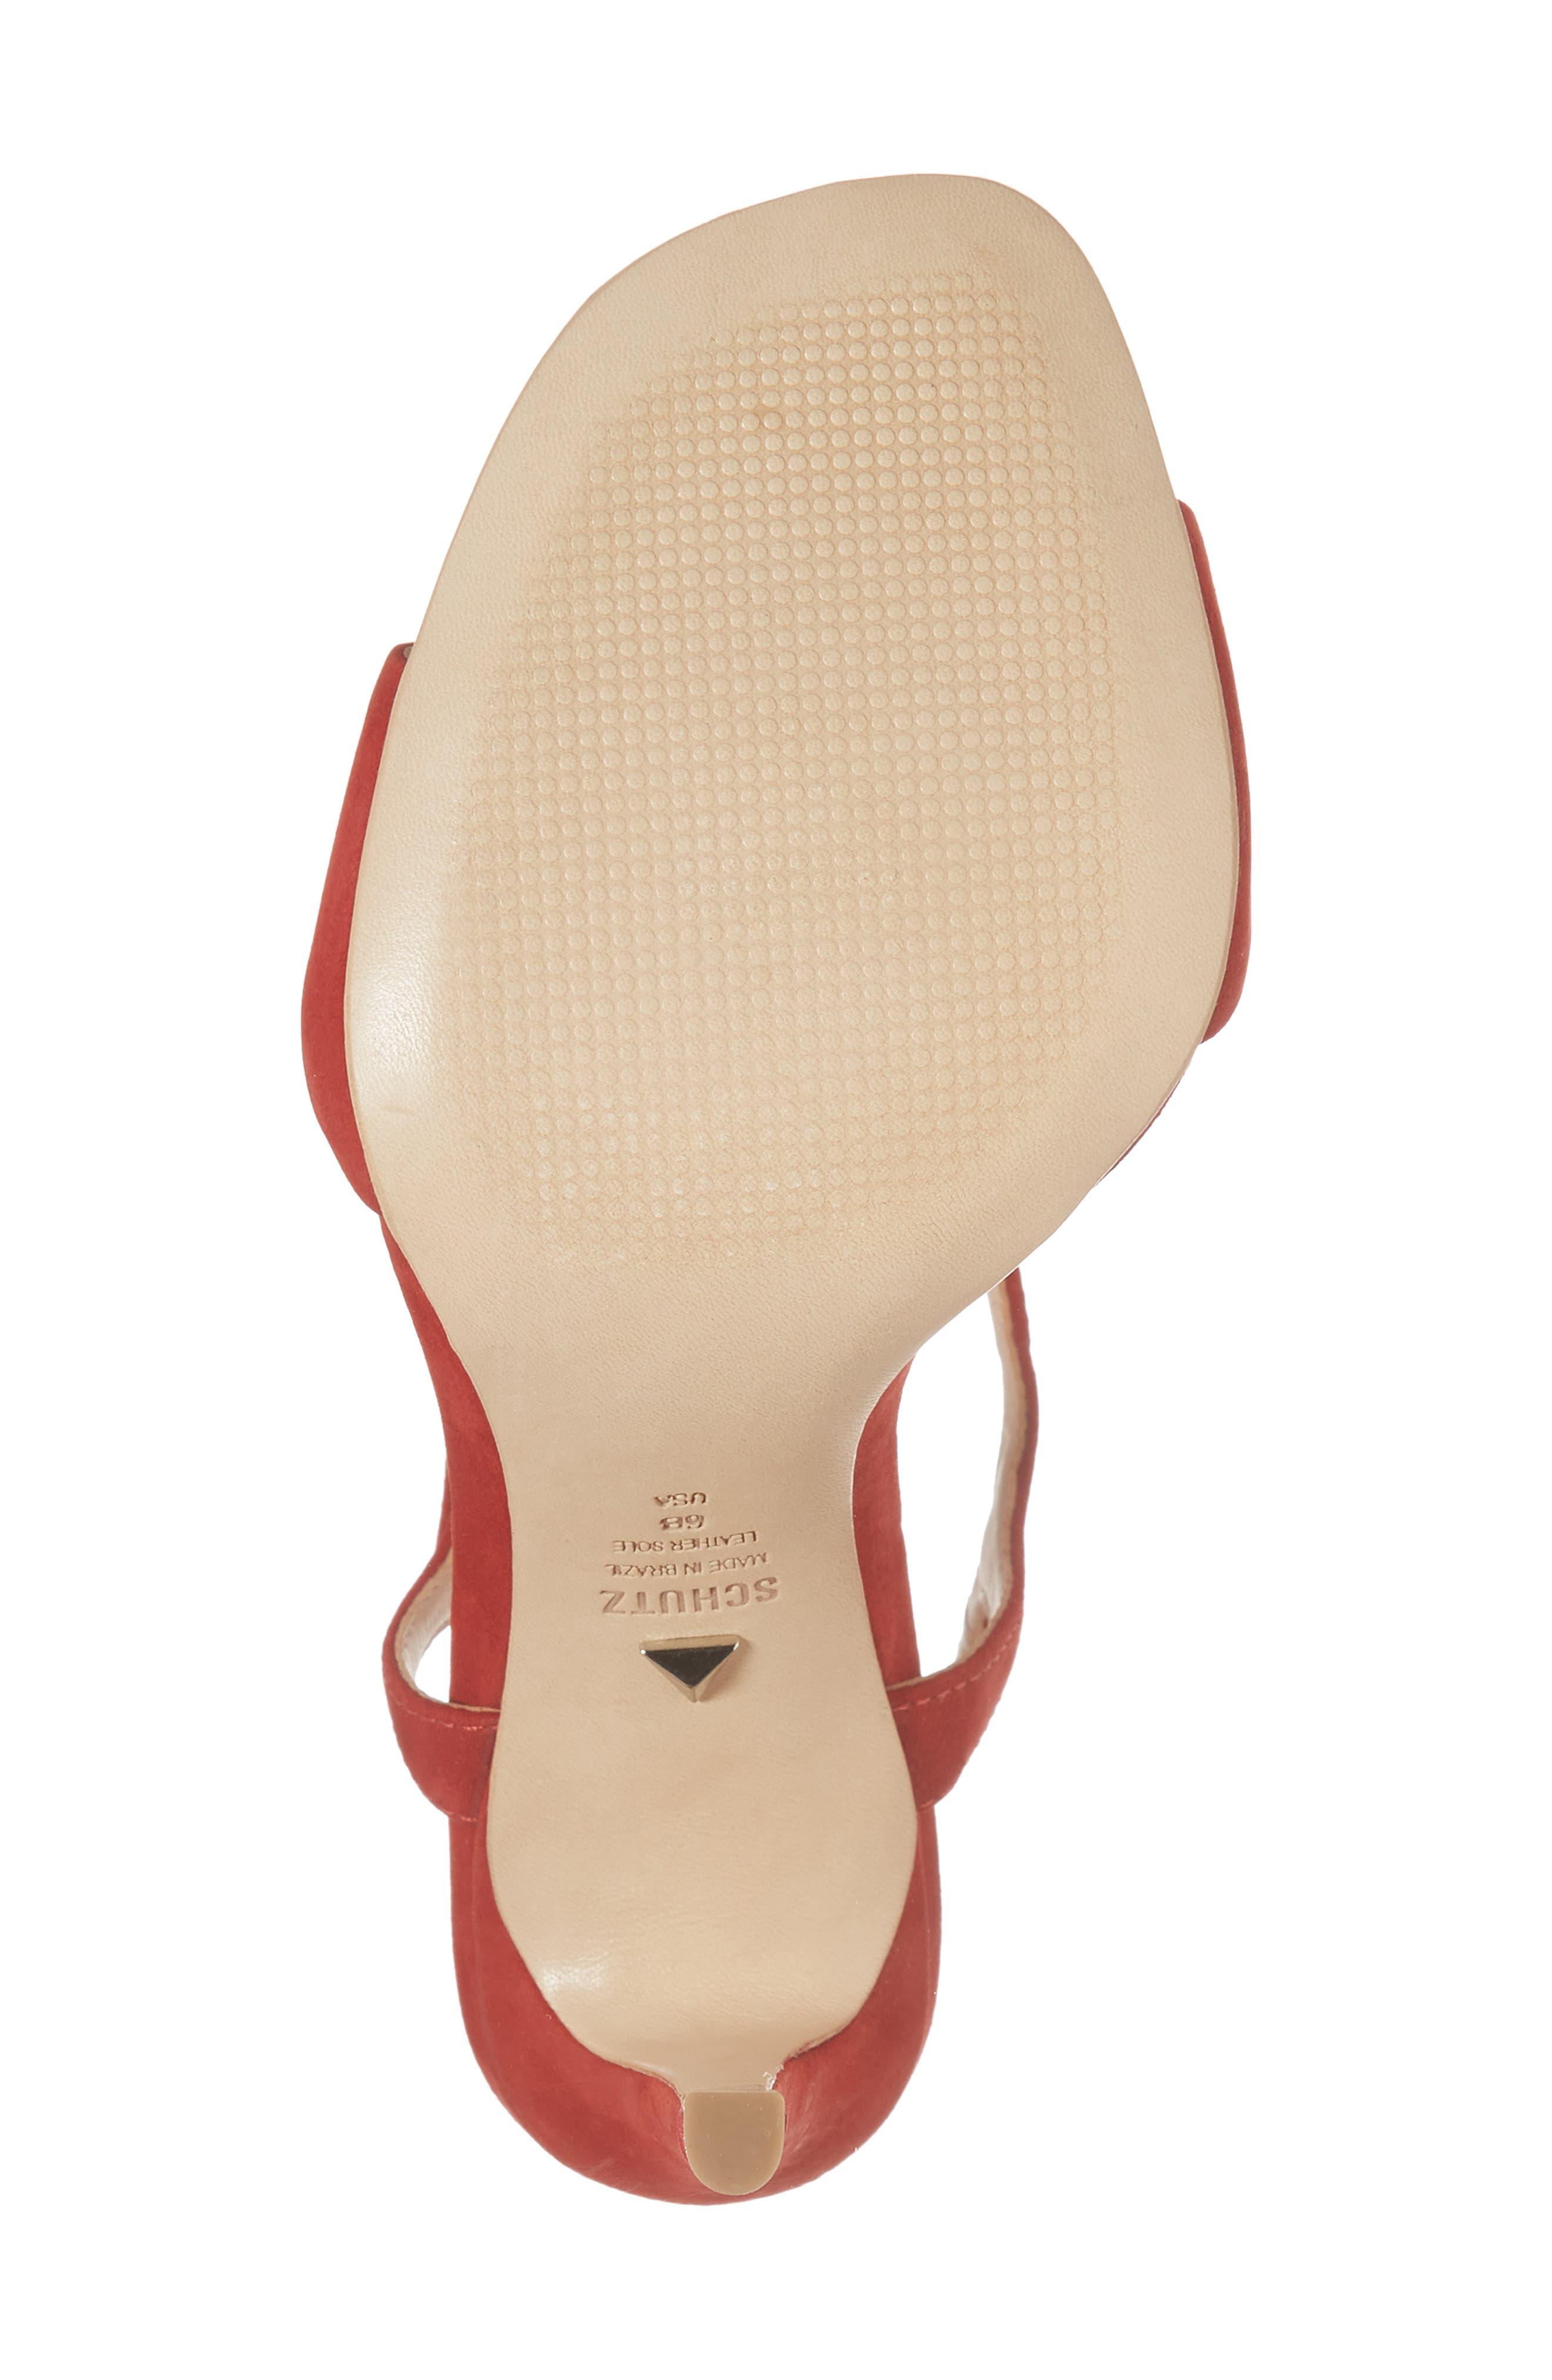 Jade Ankle Strap Sandal,                             Alternate thumbnail 6, color,                             Tango Red